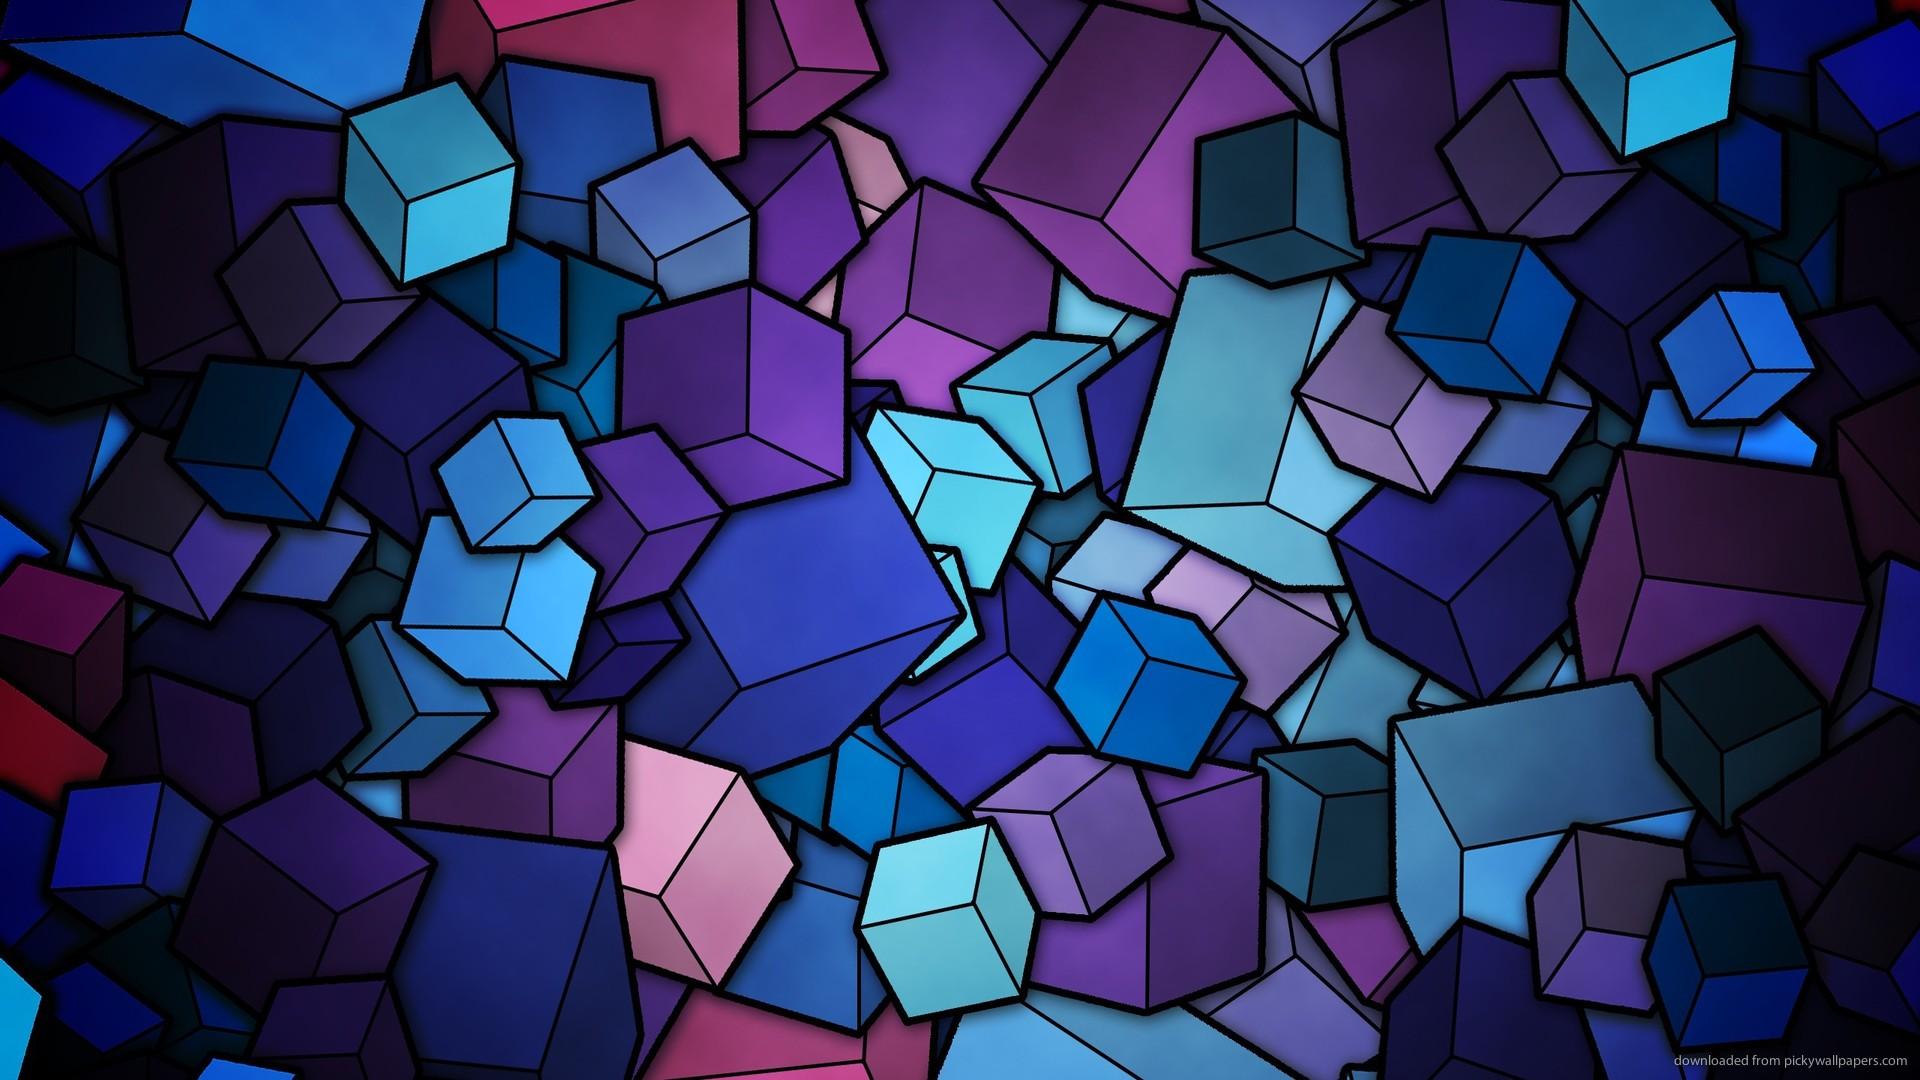 wallpaper blue cubes abstract 1920x1080 1920x1080